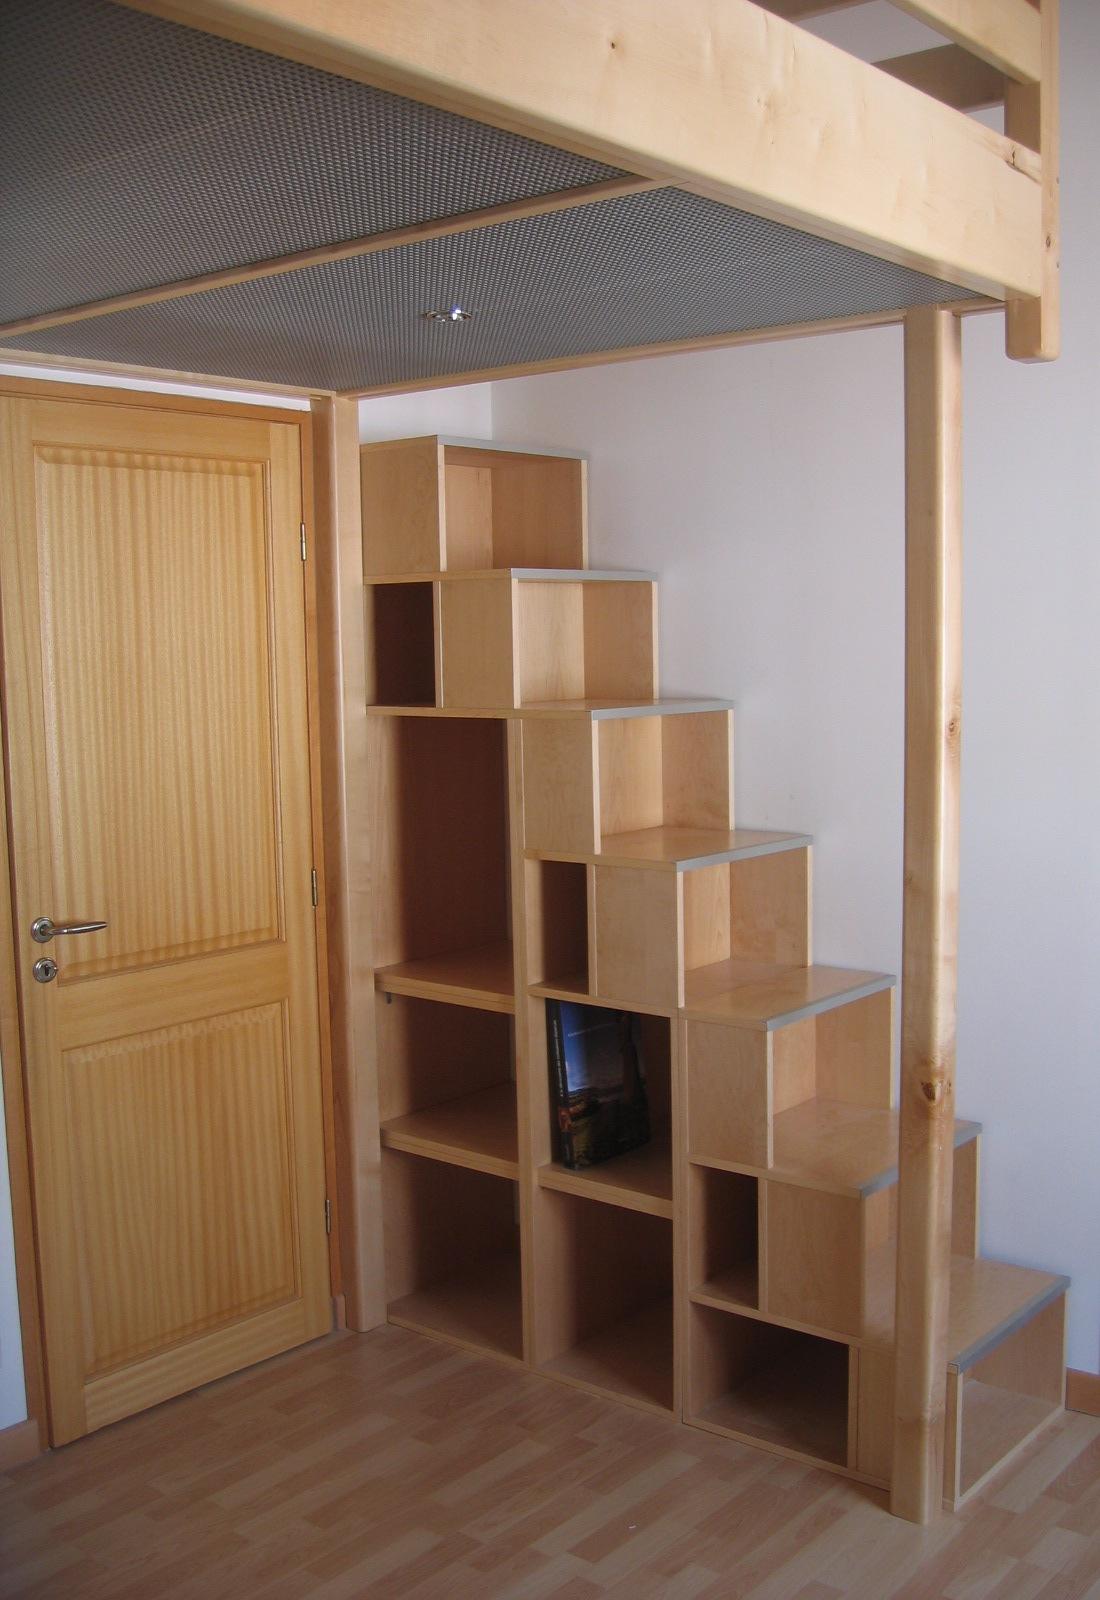 Fabrication mezzanine sur mesure en bois  Toulouse  Stphane Germain Ebniste